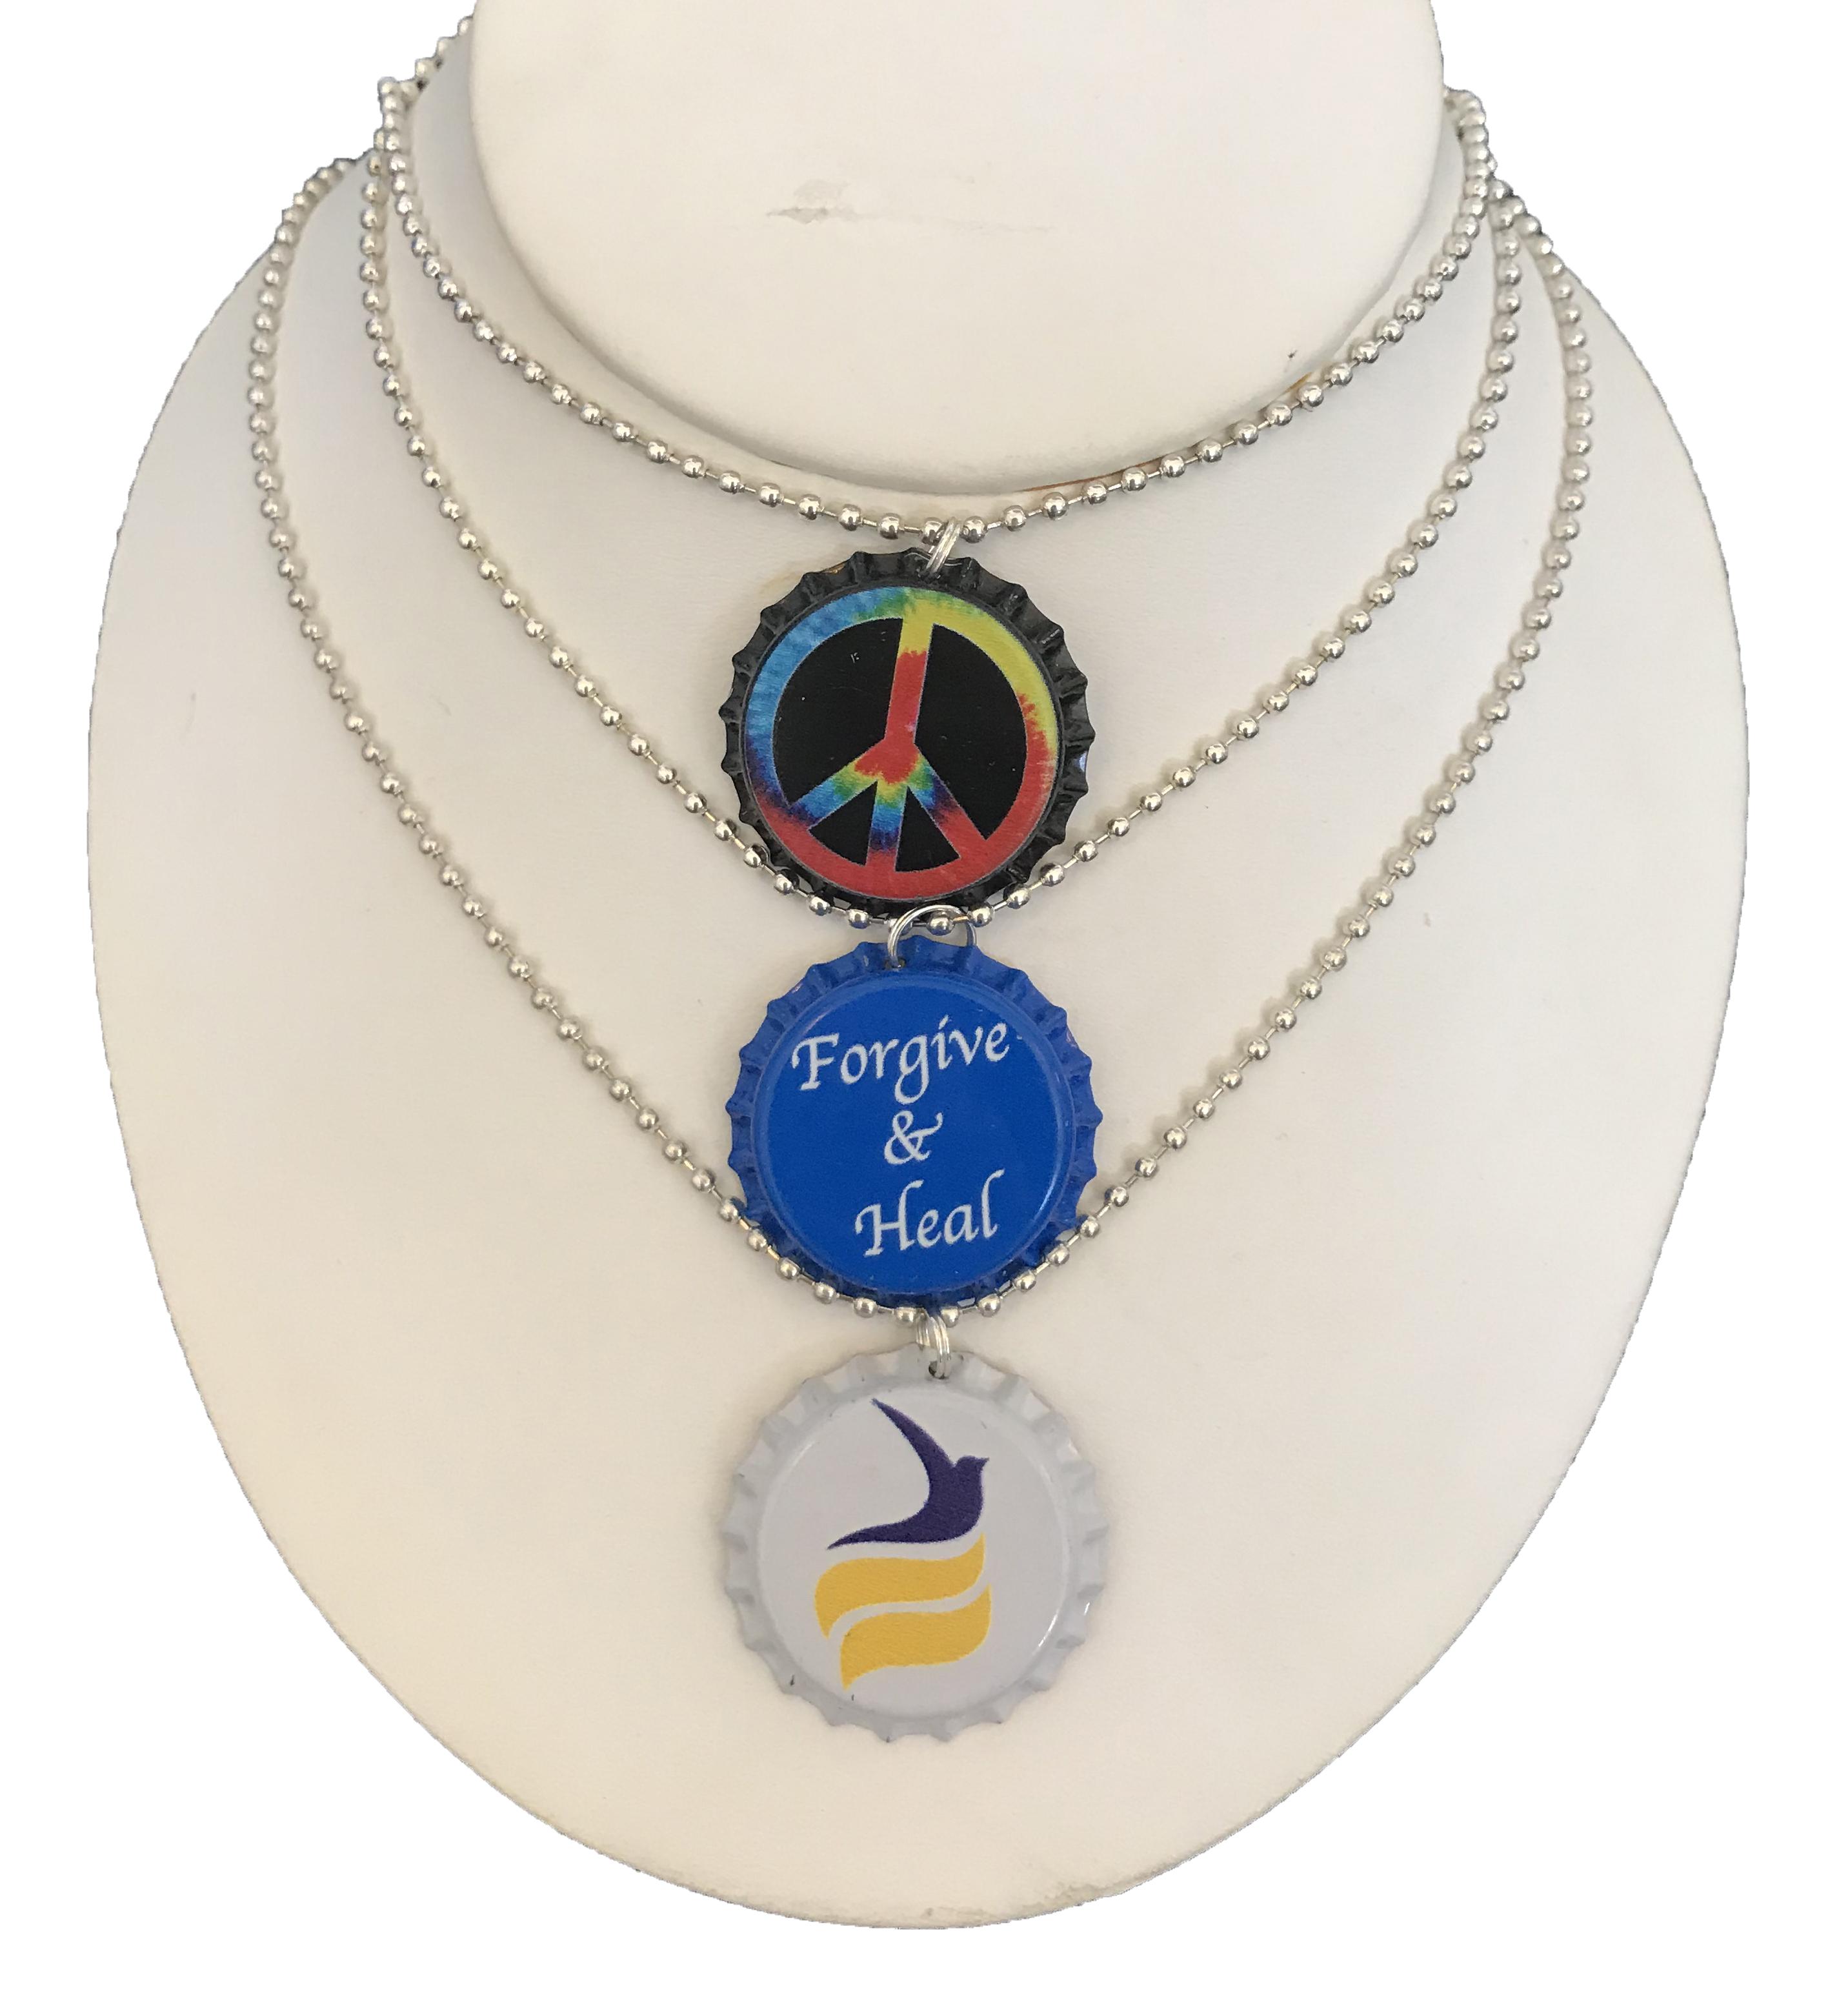 Bottle Cap Necklace (USA Shipping)